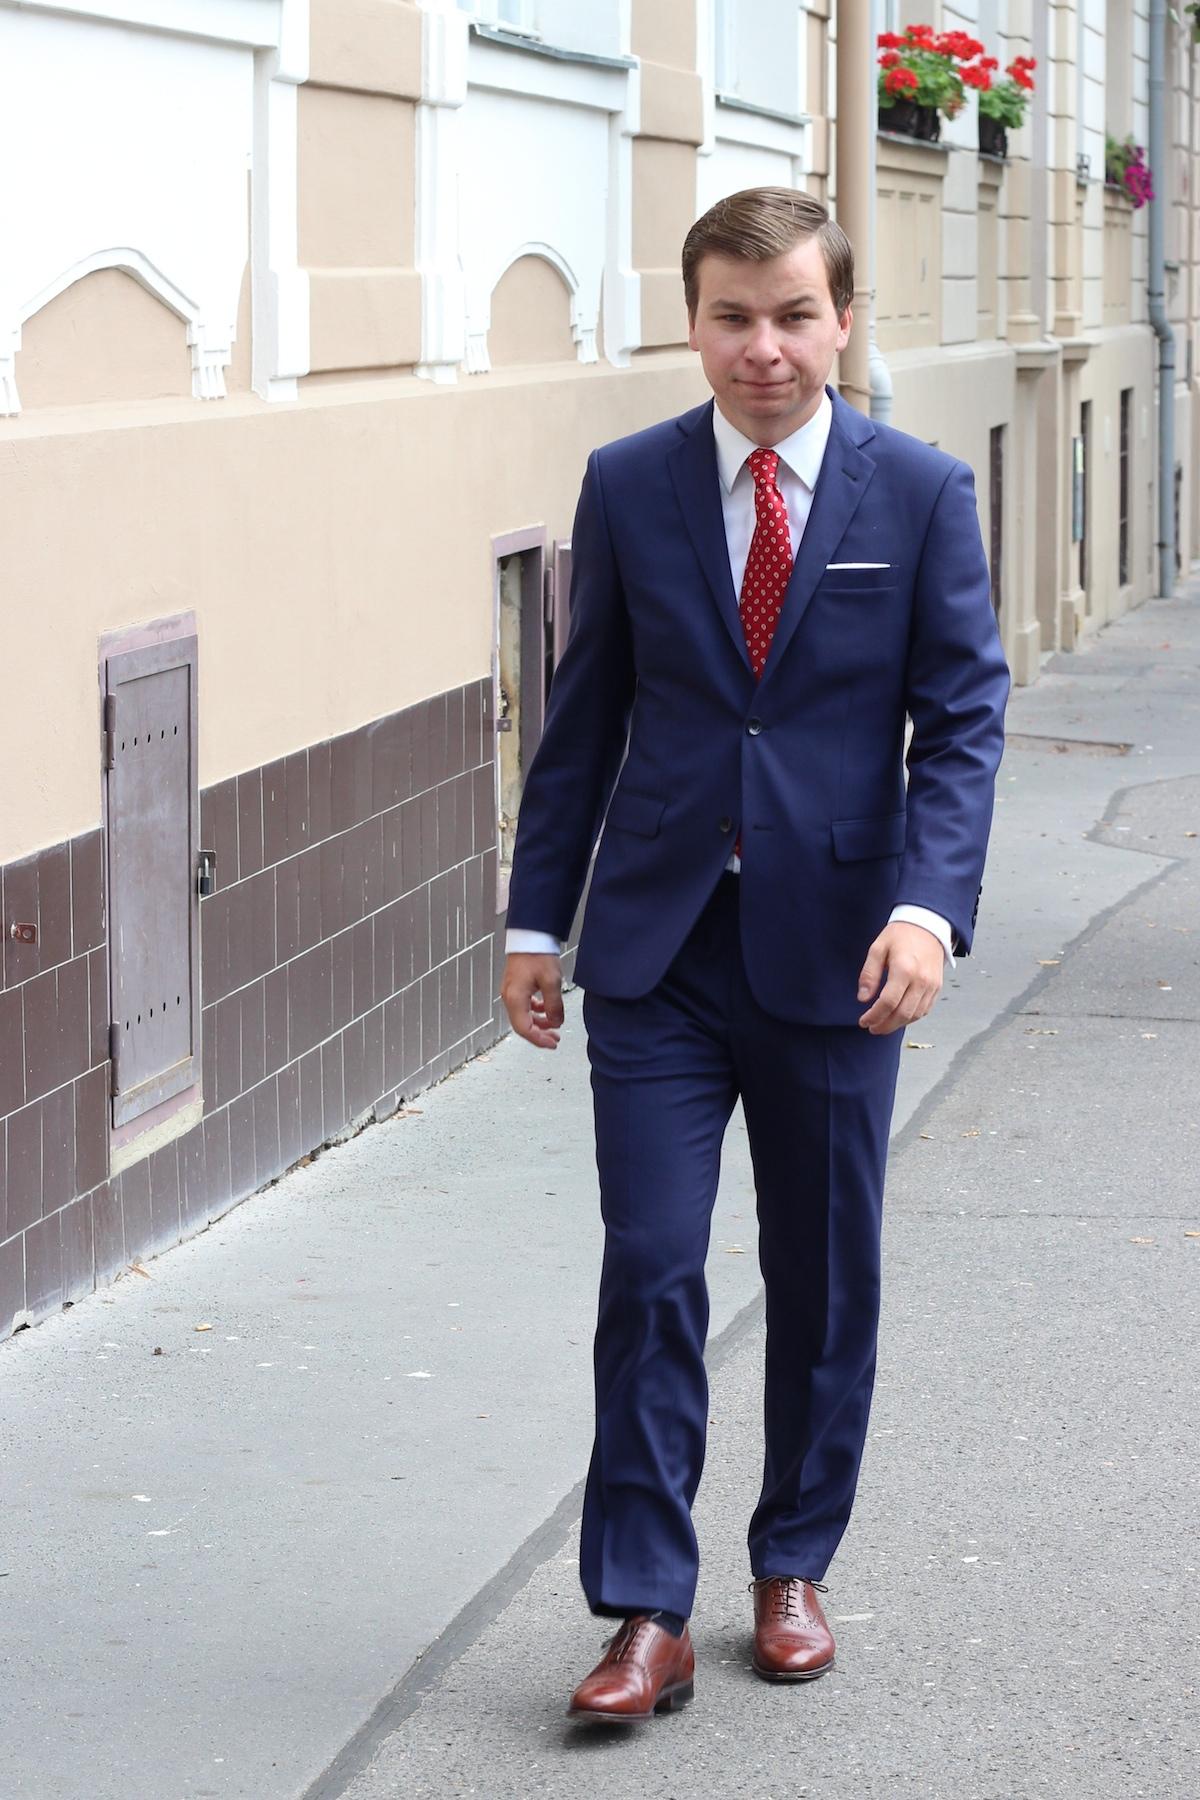 871224a47f2 Recenze obleku na míru od Friendly Suits – Pravý Gentleman